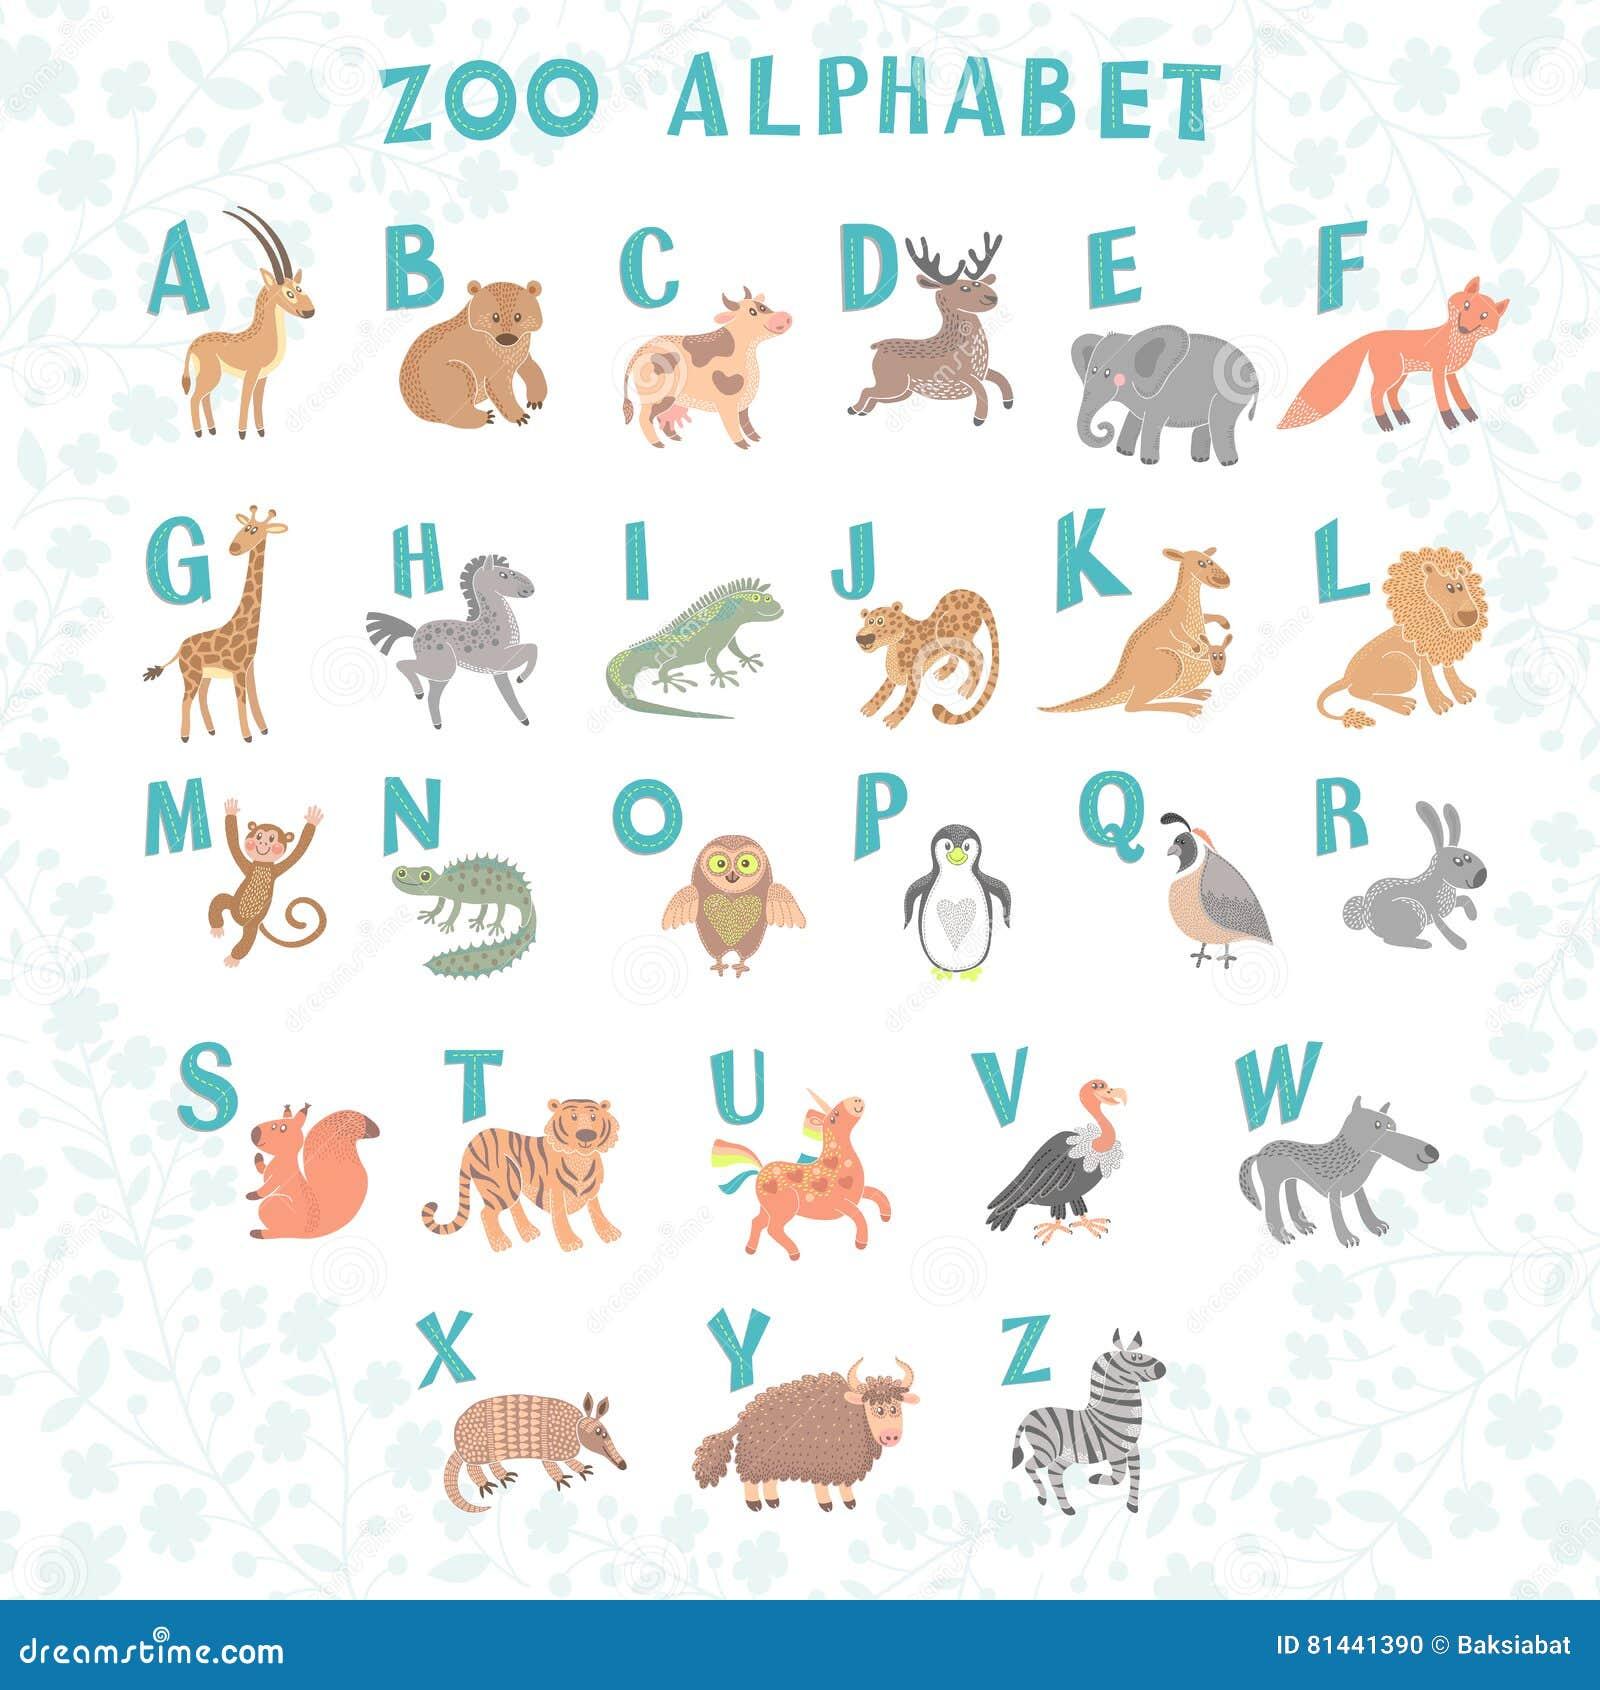 Learn A to Z alphabets with animals. Alphabet puzz